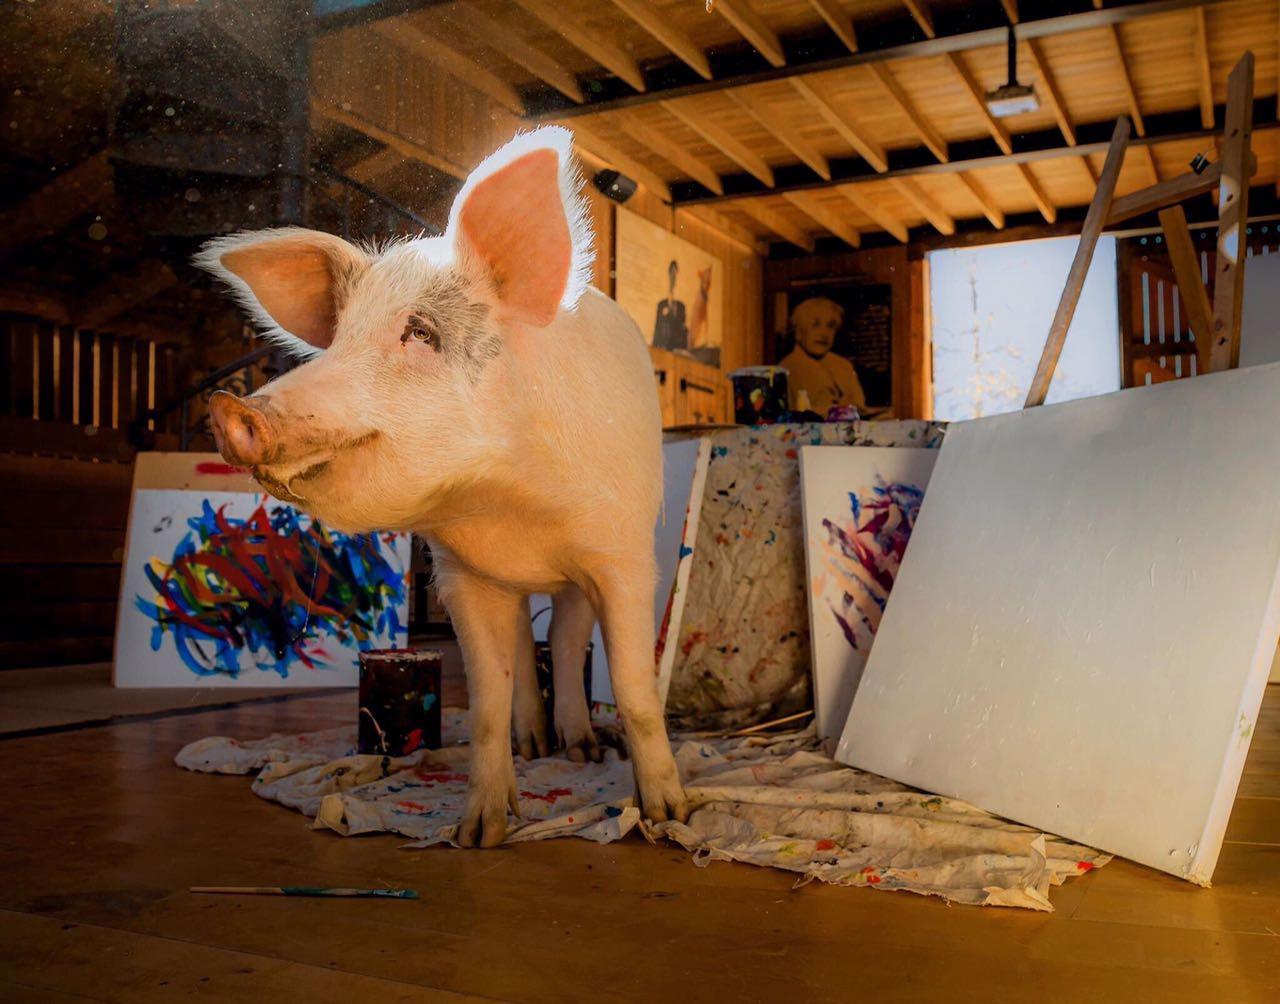 La cerdita que realiza obras de arte — Pigcasso